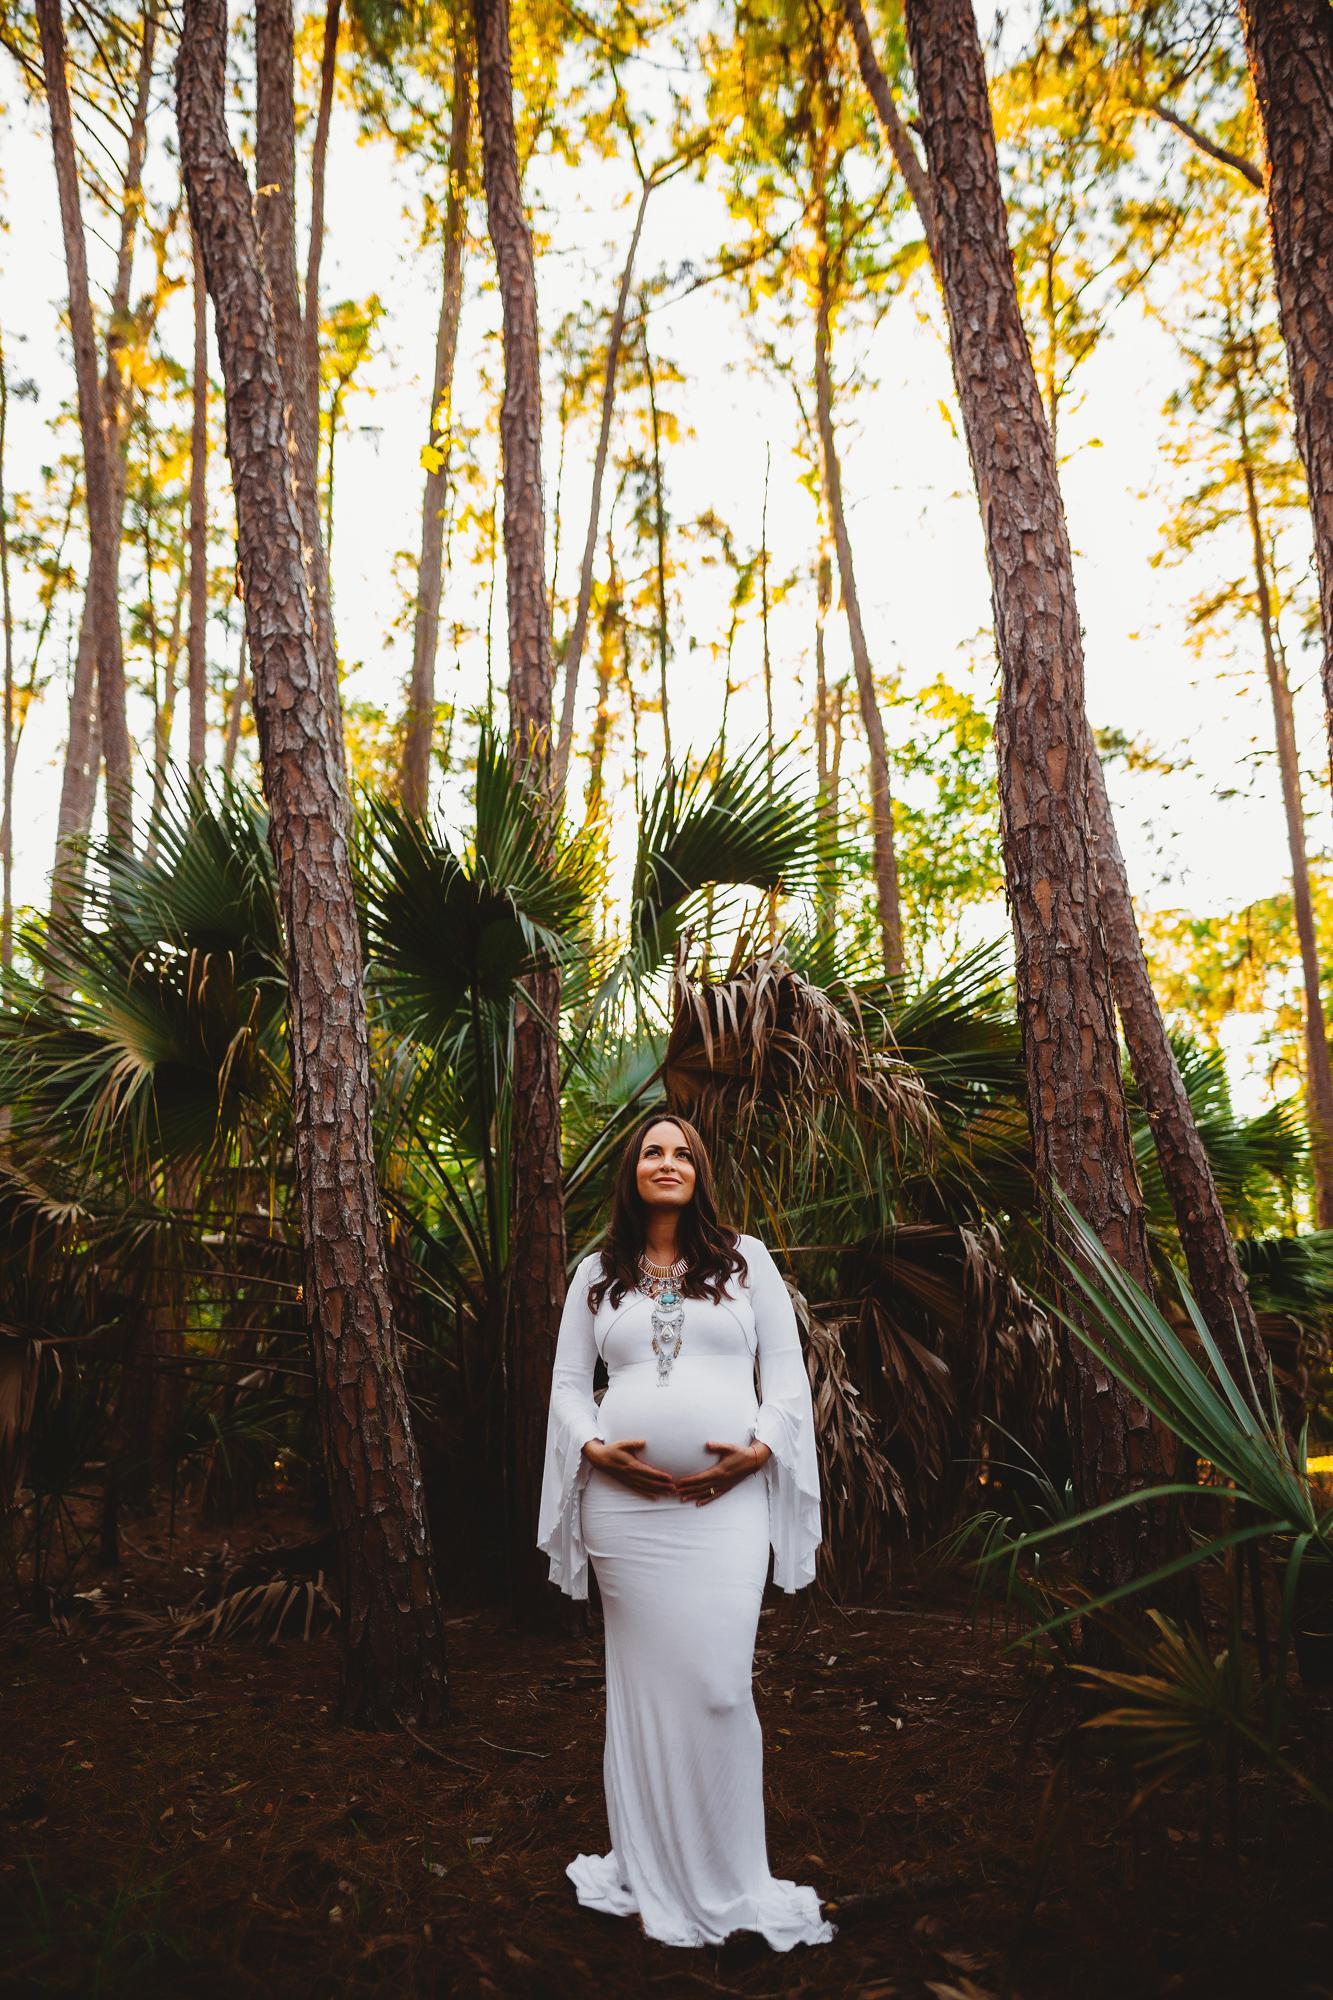 Outdoor Boho Maternity Photo Shoot The Pinellas County Maternity Photographer